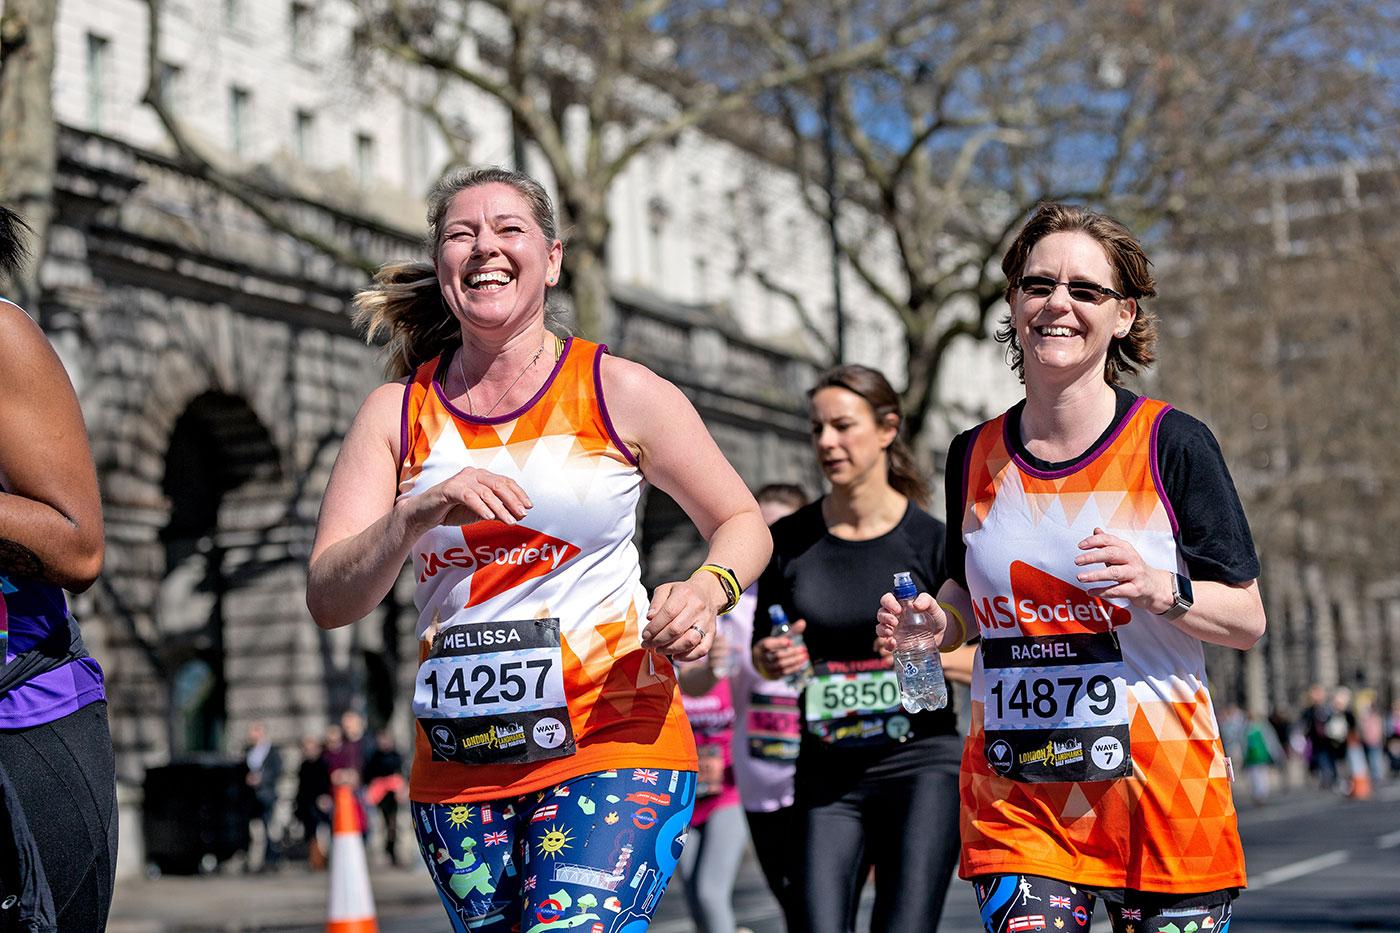 The London Landmarks Half Marathon